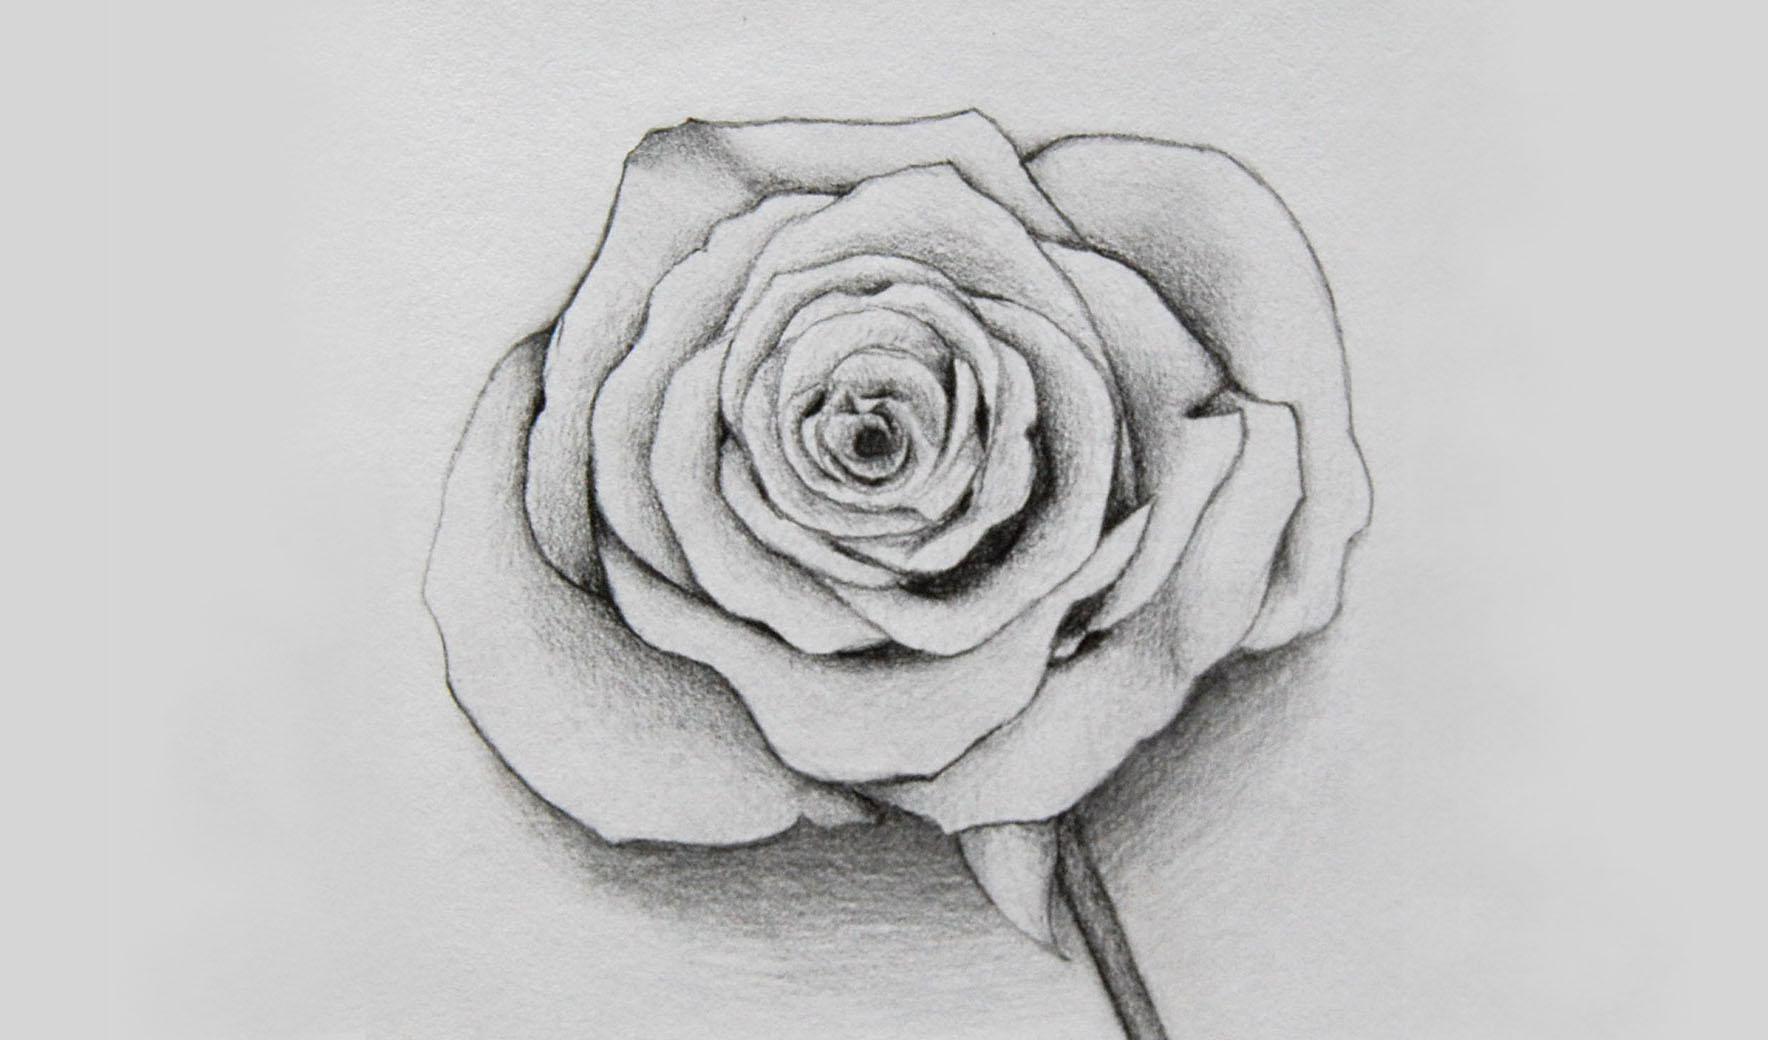 Rose Bleistift